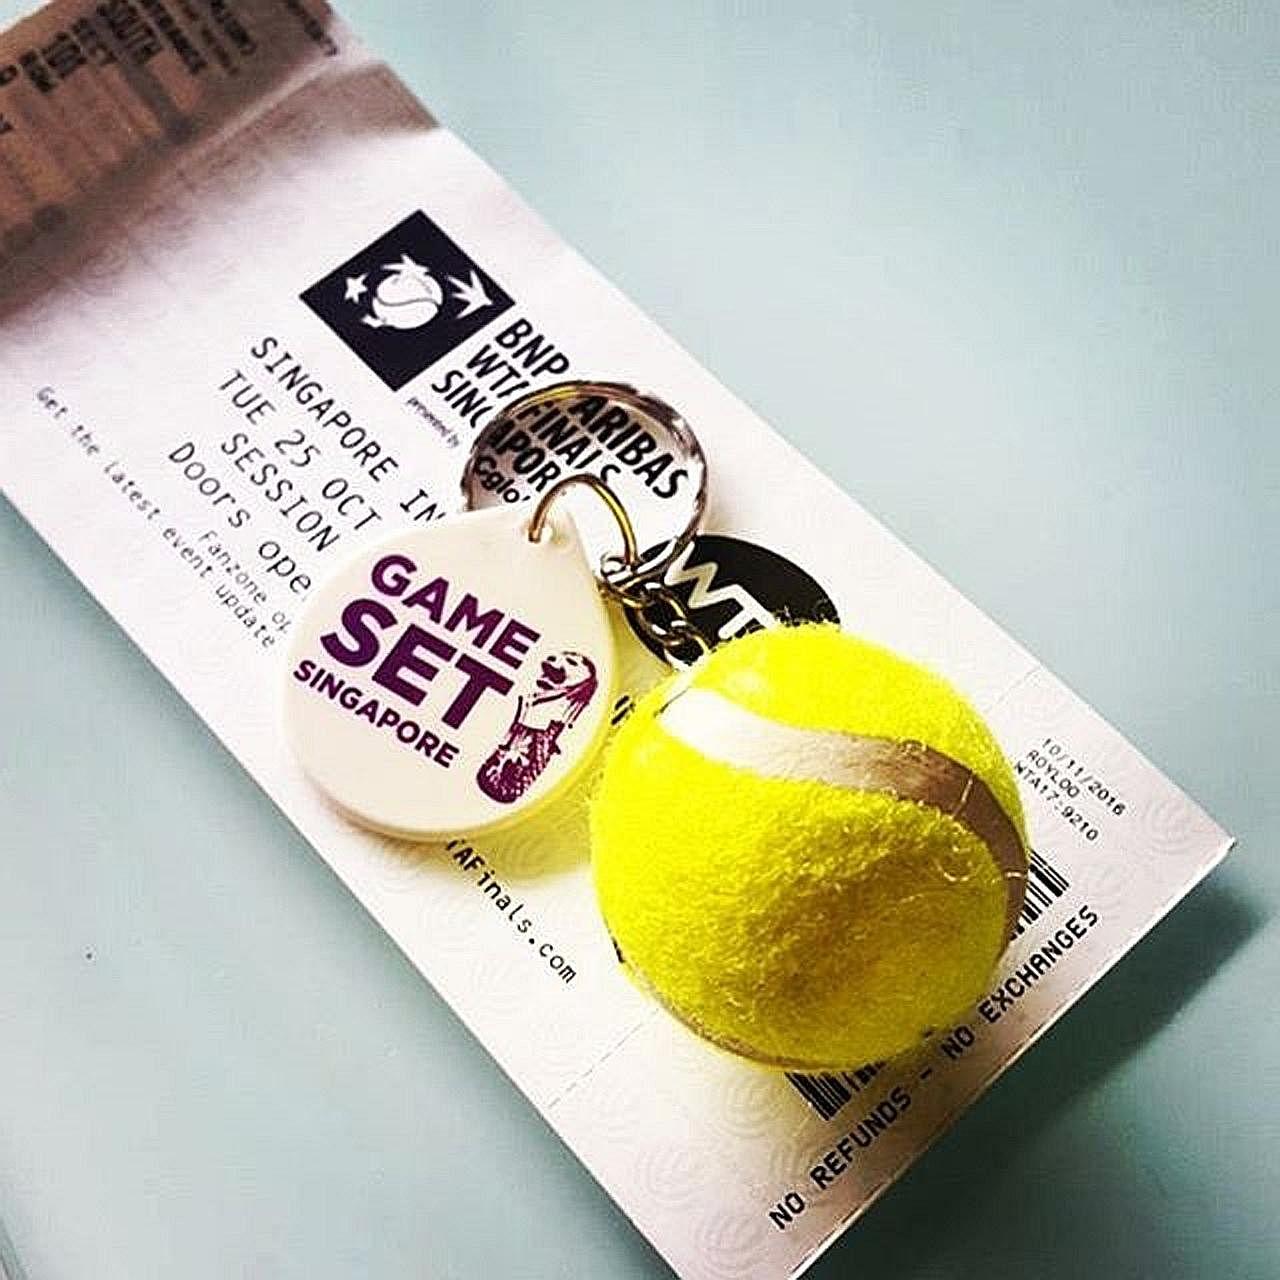 Doubles player Lucie Safarova, one half of #teambucie alongside partner Bethanie Mattek-Sands, gets a makeover.